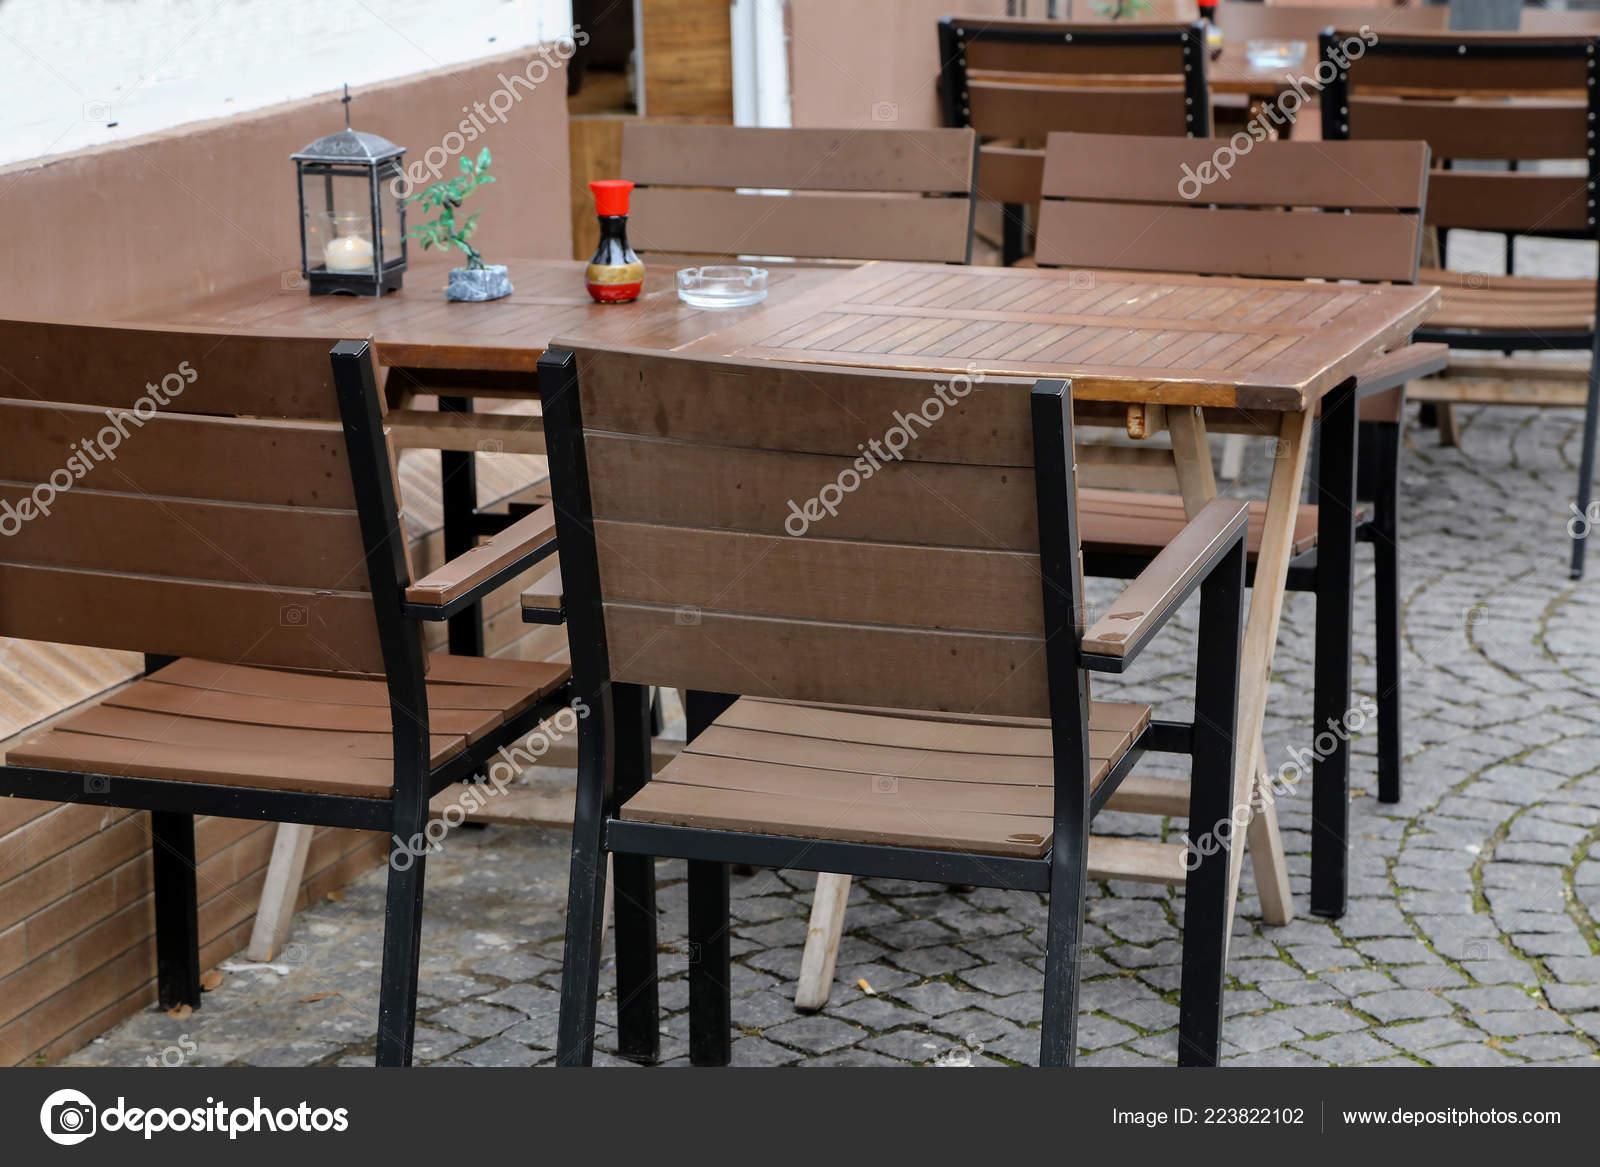 Cozy Street Restaurant Tables Chairs Street Stock Photo C Malleo 223822102